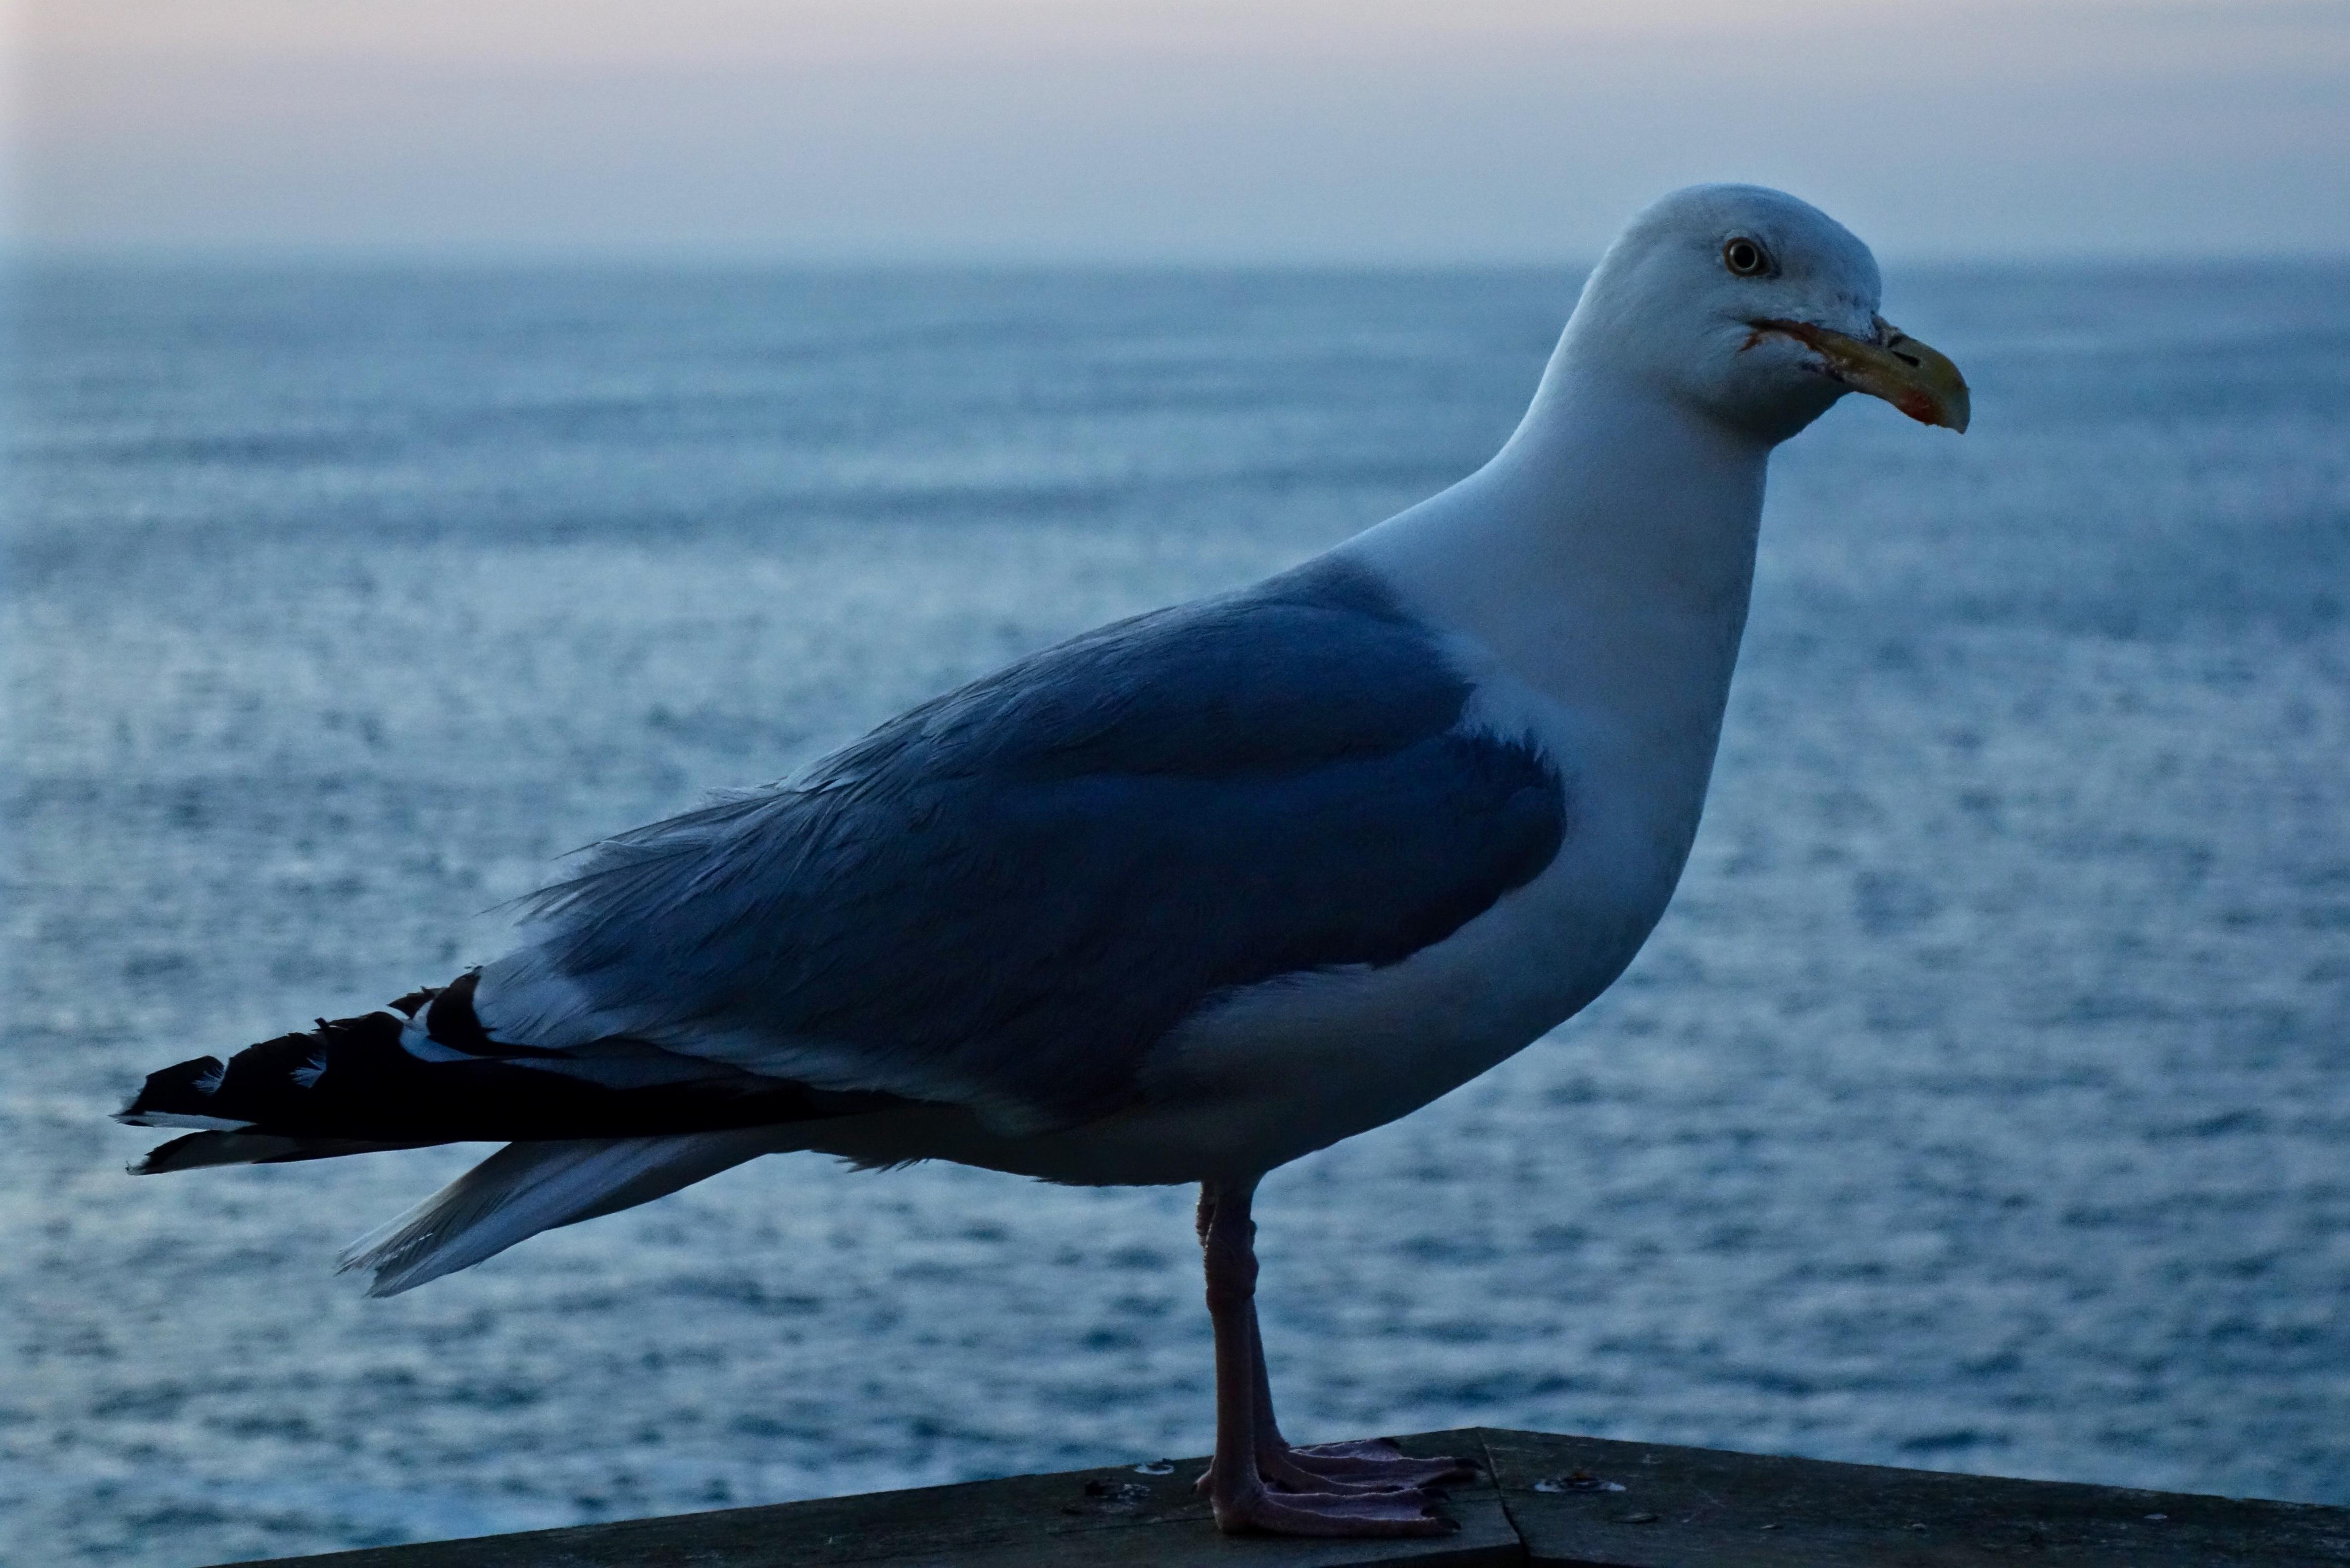 Trevone Bay, Cornwall